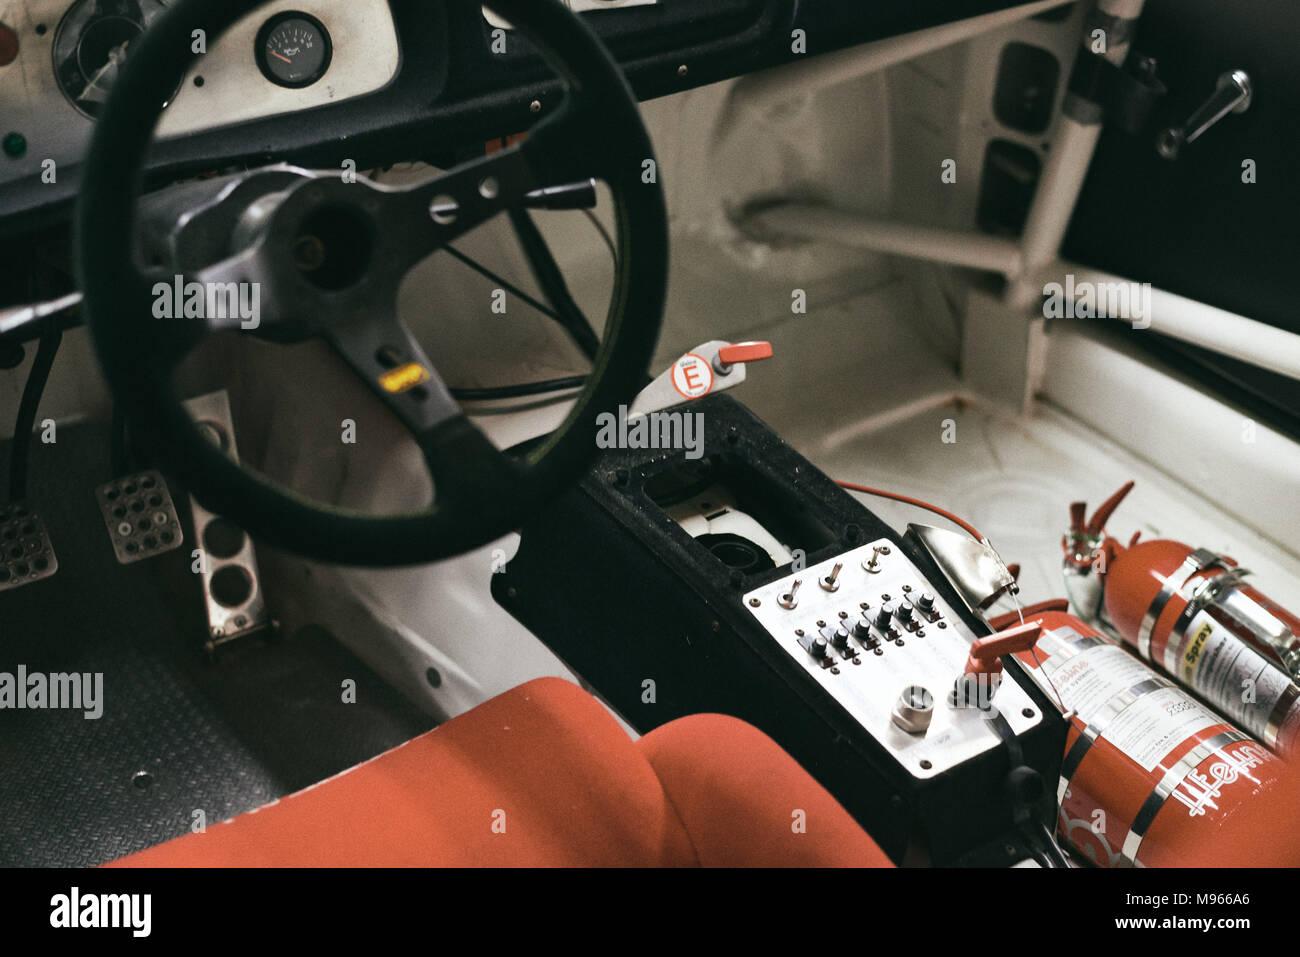 Vintage Racecar Interior Stock Photo 177772286 Alamy